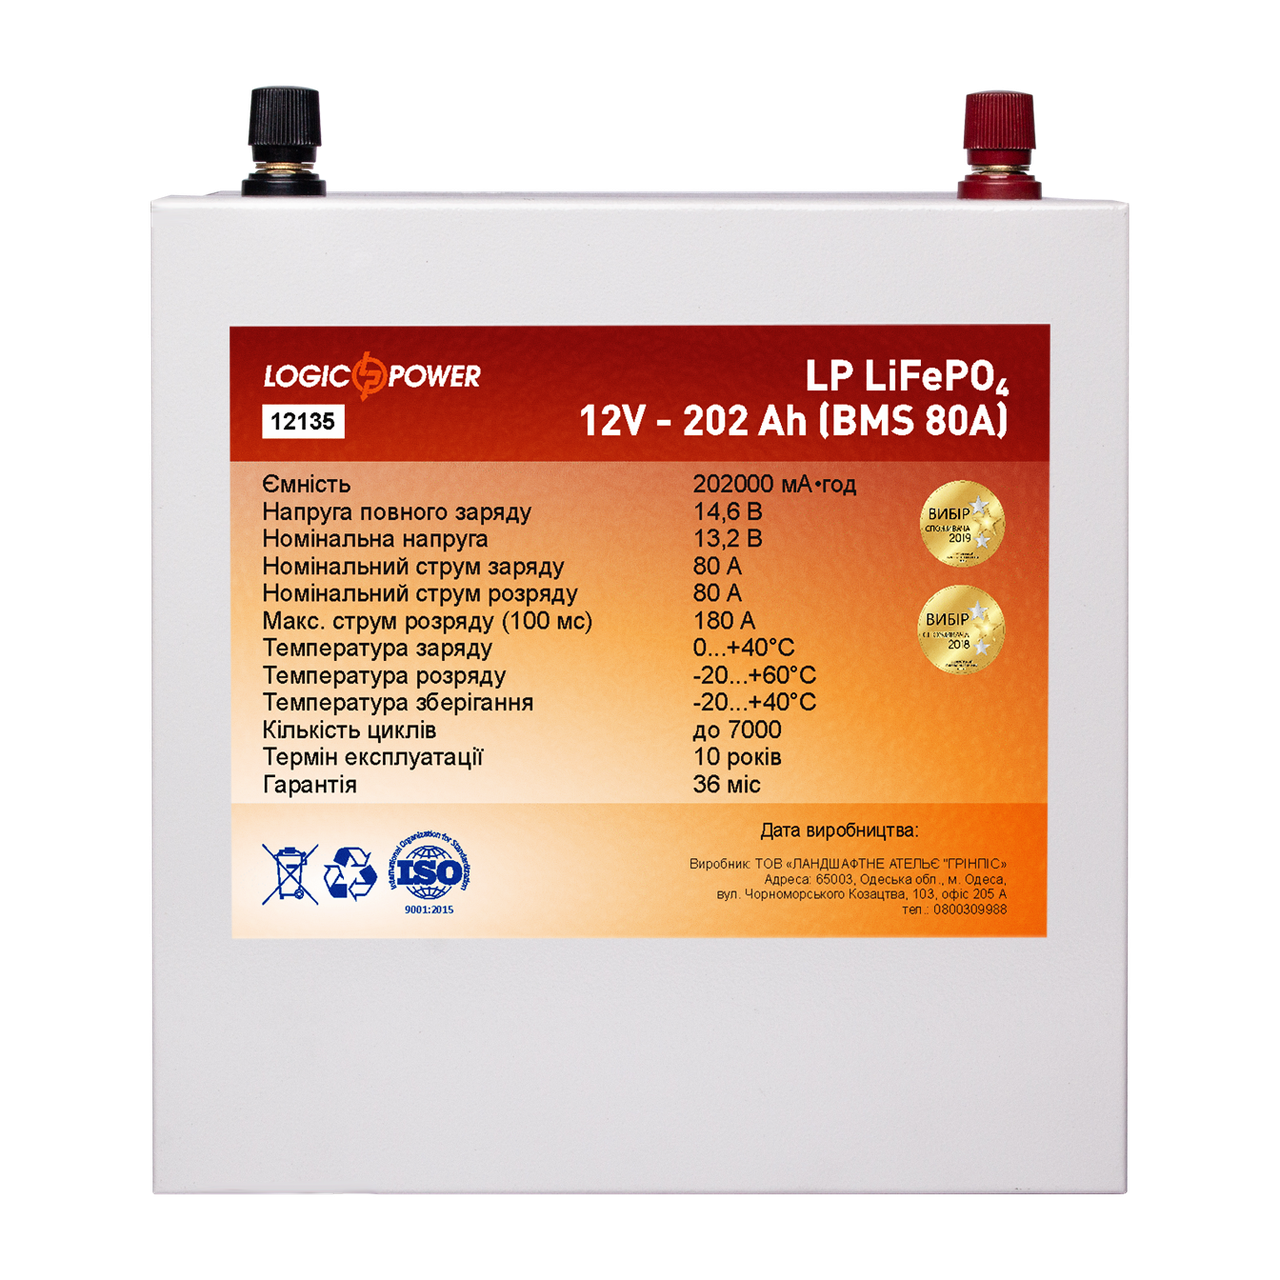 Аккумулятор LP LiFePO4 12V - 202 Ah (BMS 80A) металл